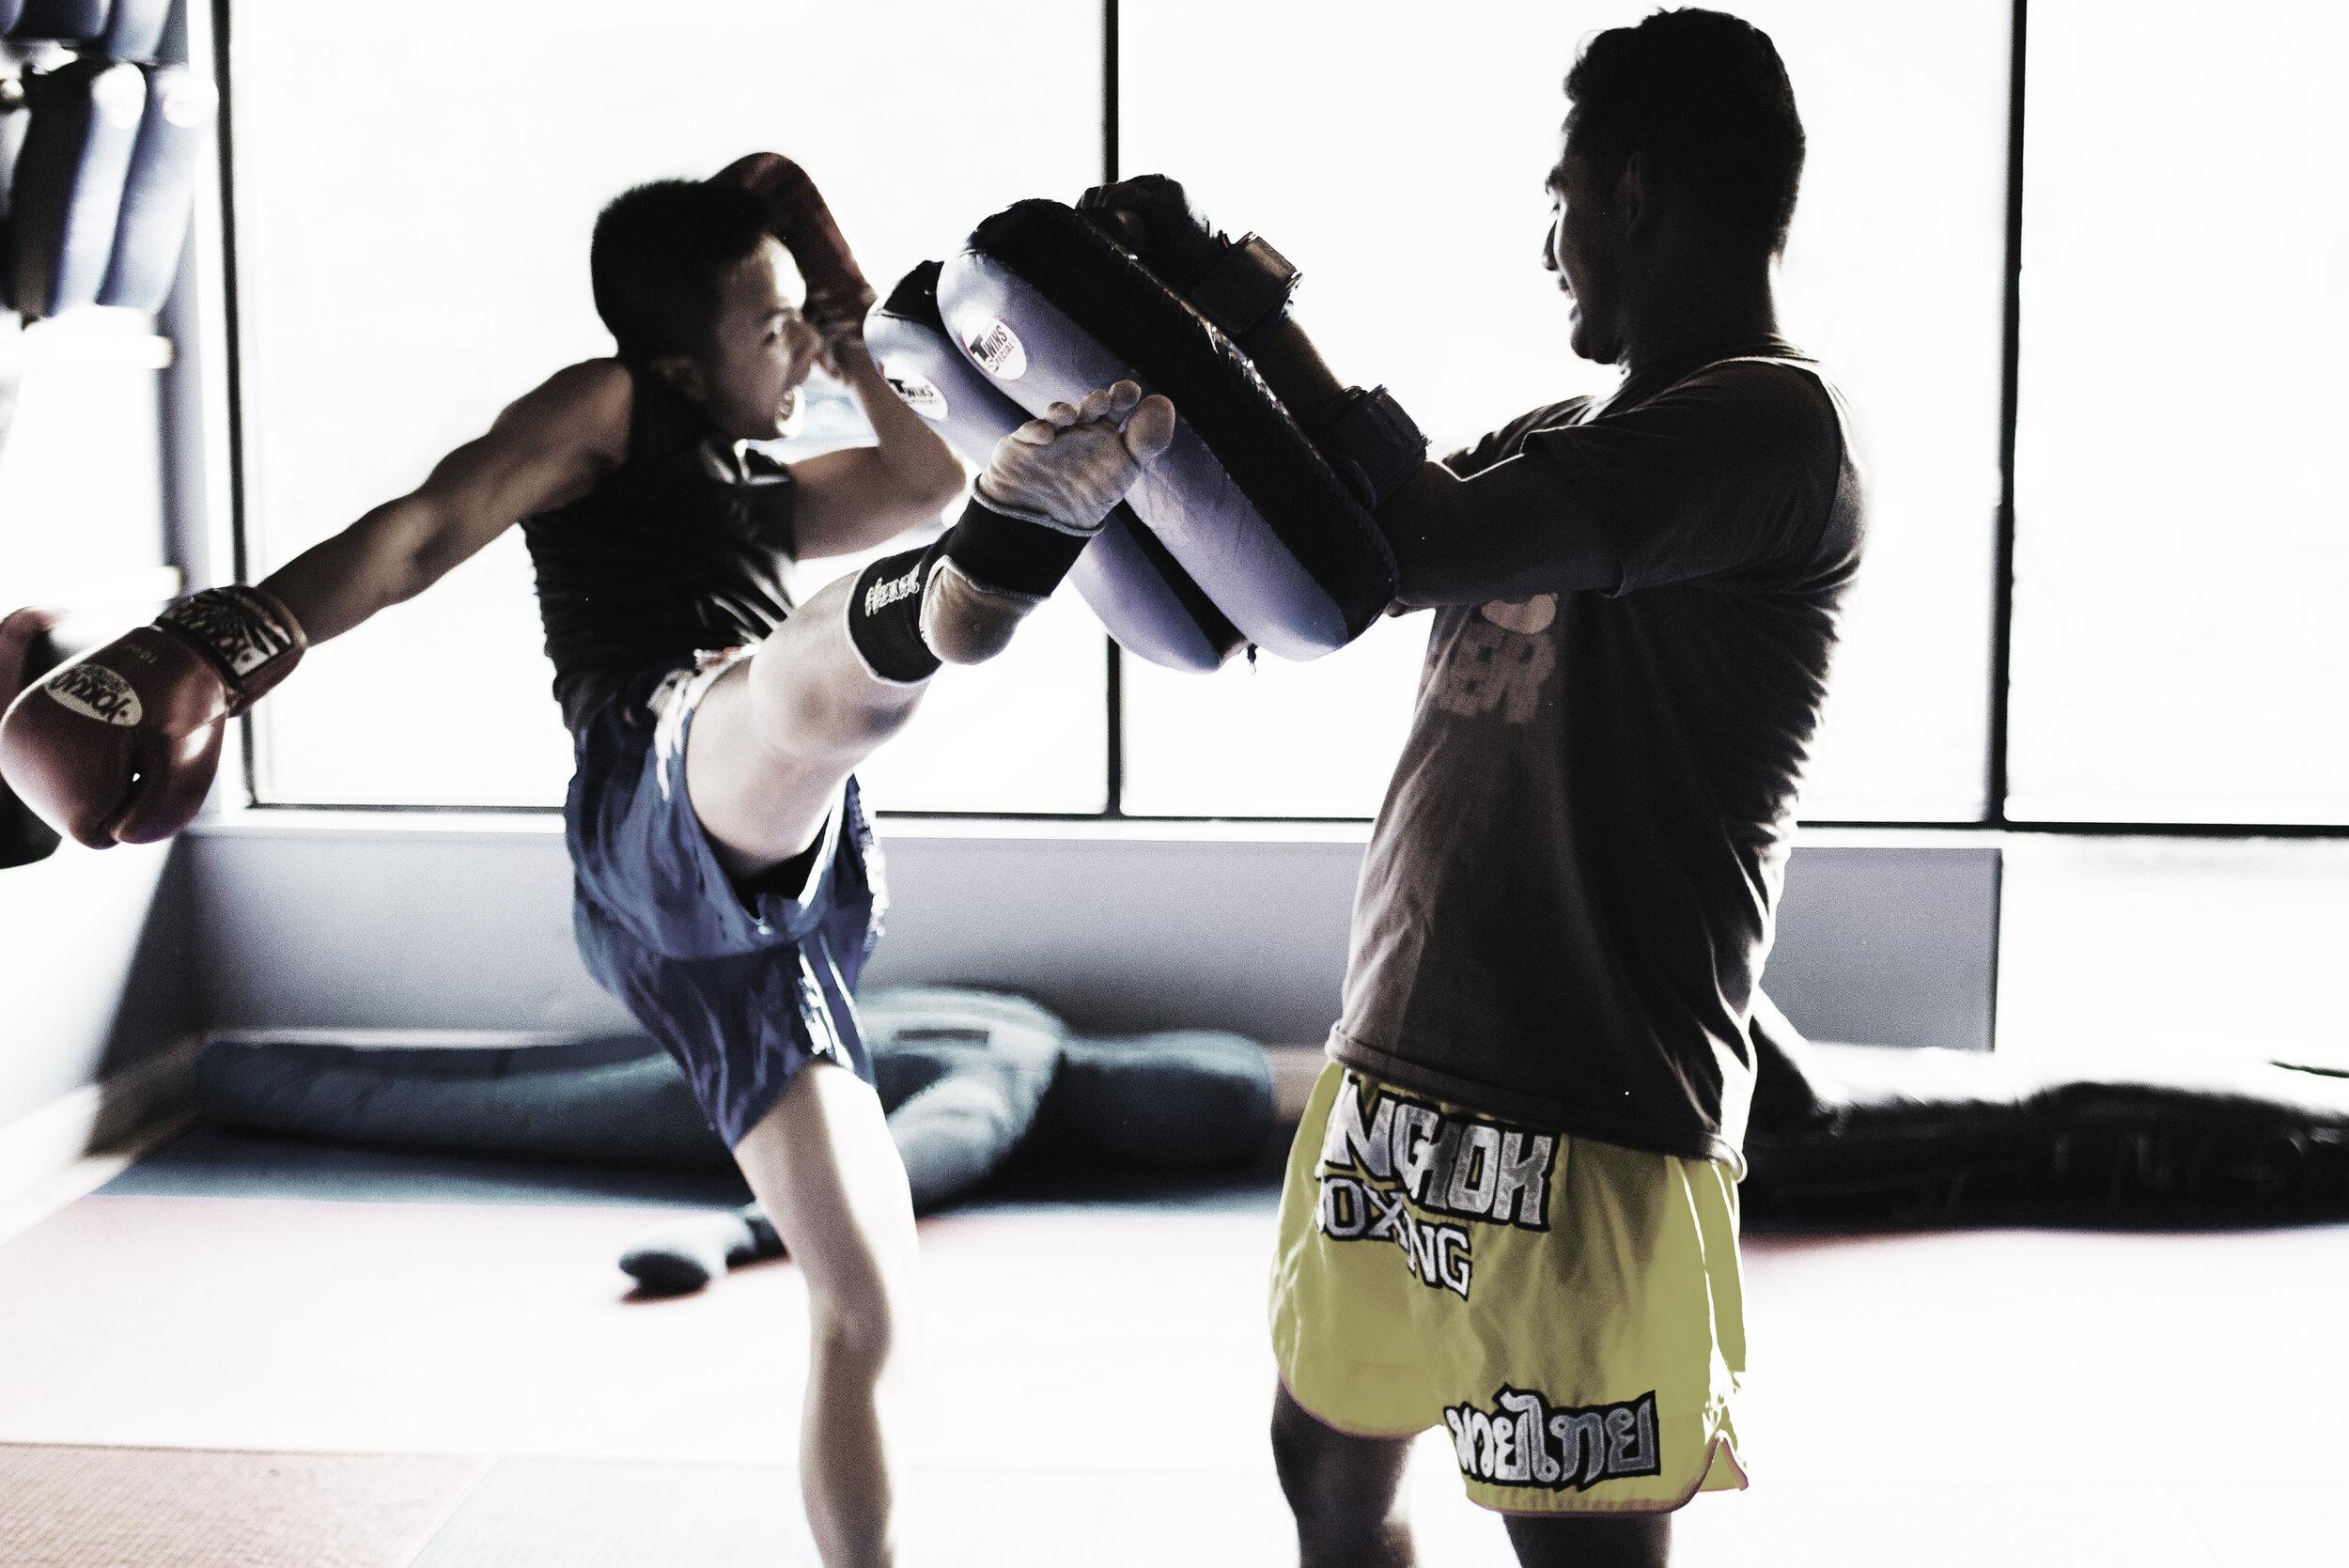 Personal Training Image 2.jpg